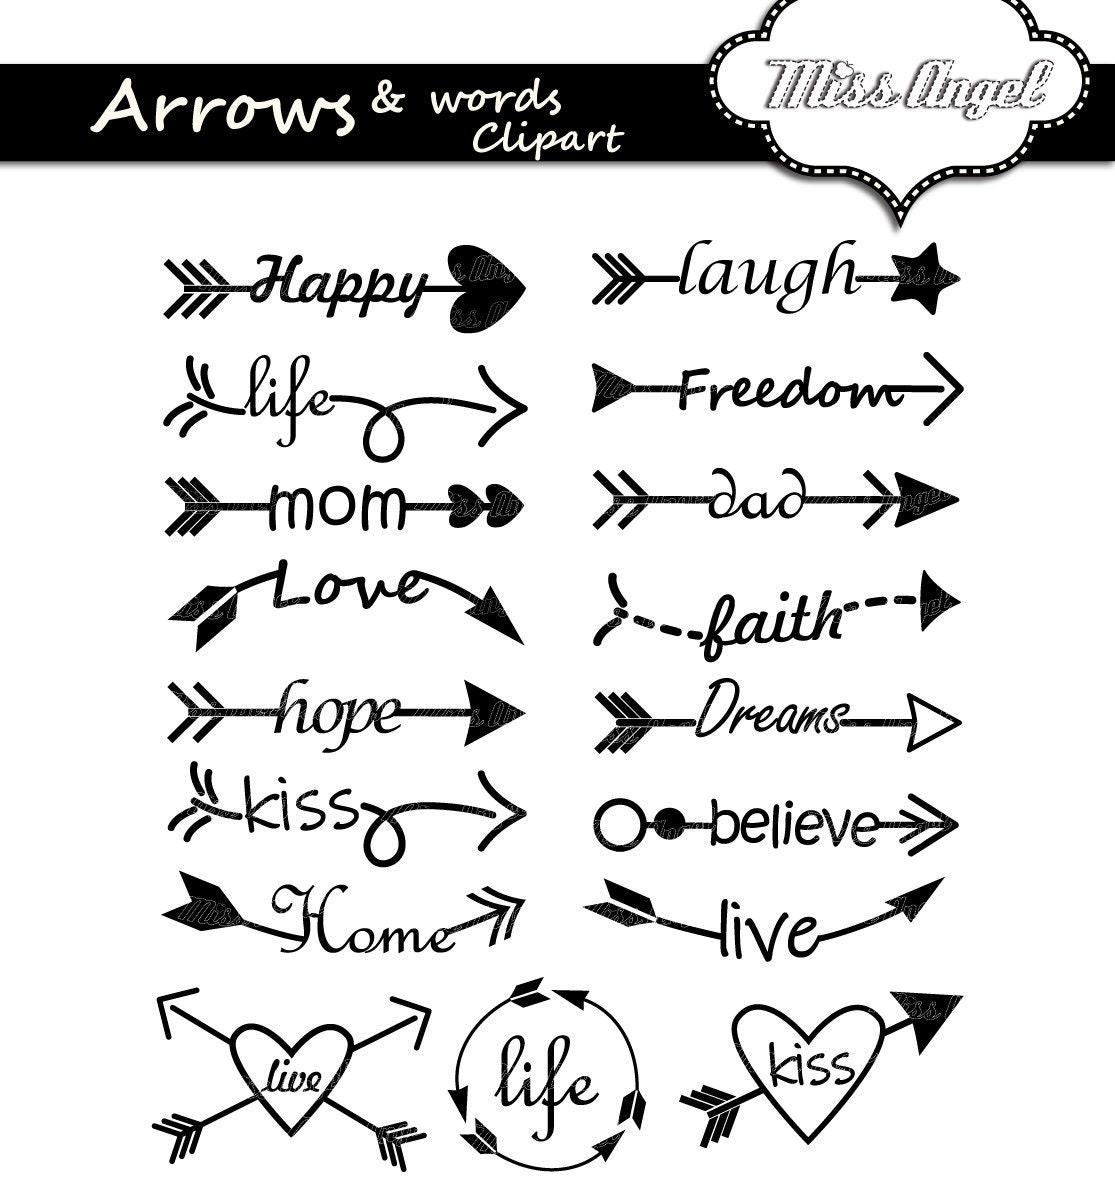 Arrows words clipart. Arrow words clip art. 17 digital ...